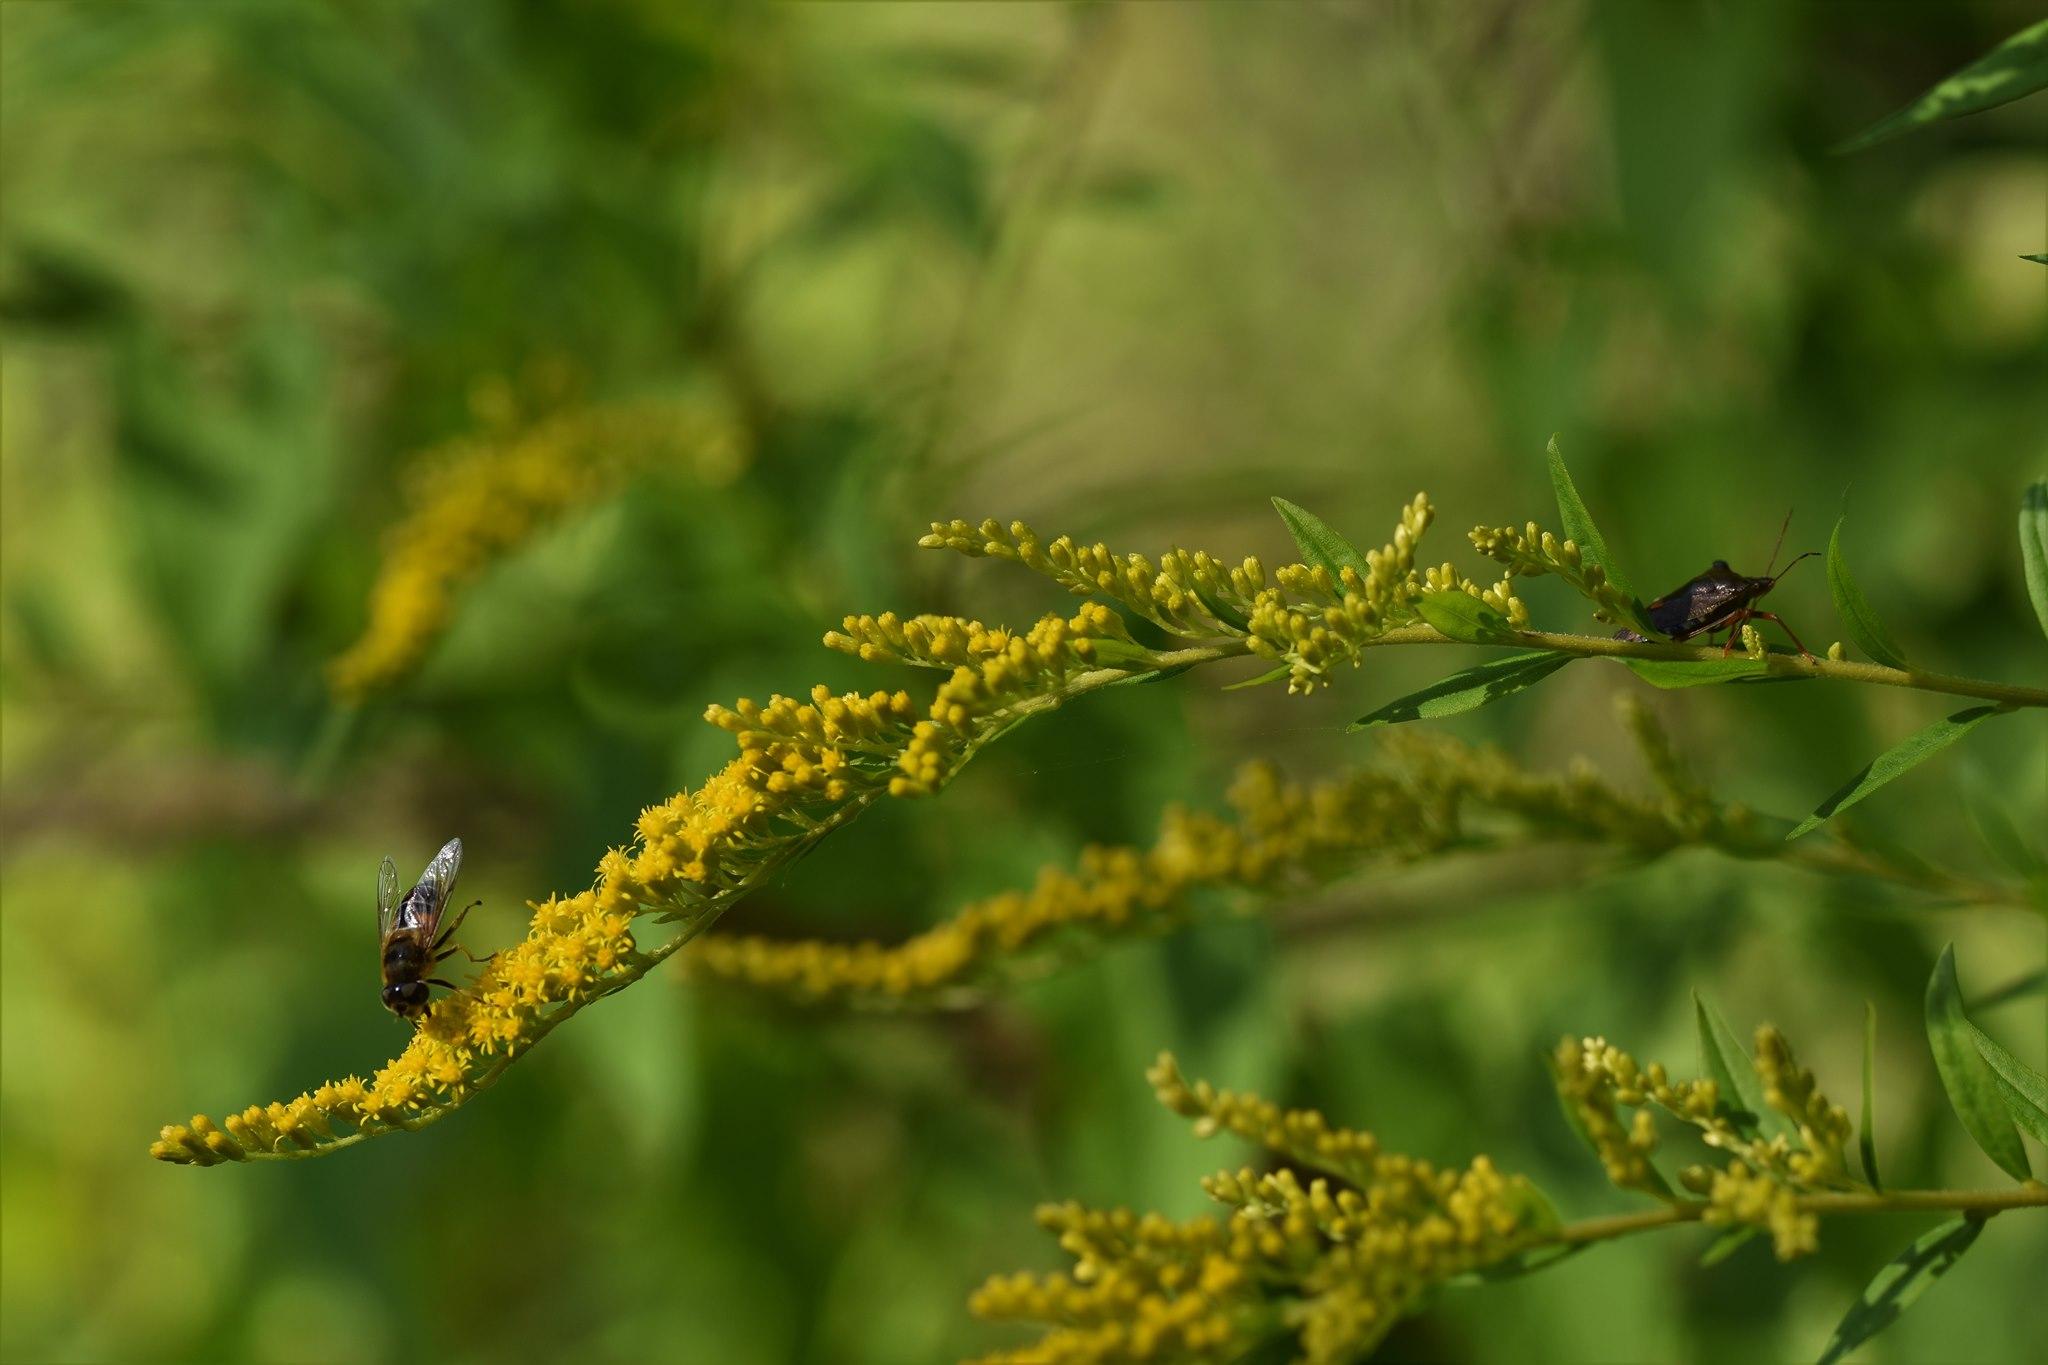 Goldrutenblüte mit Insekten